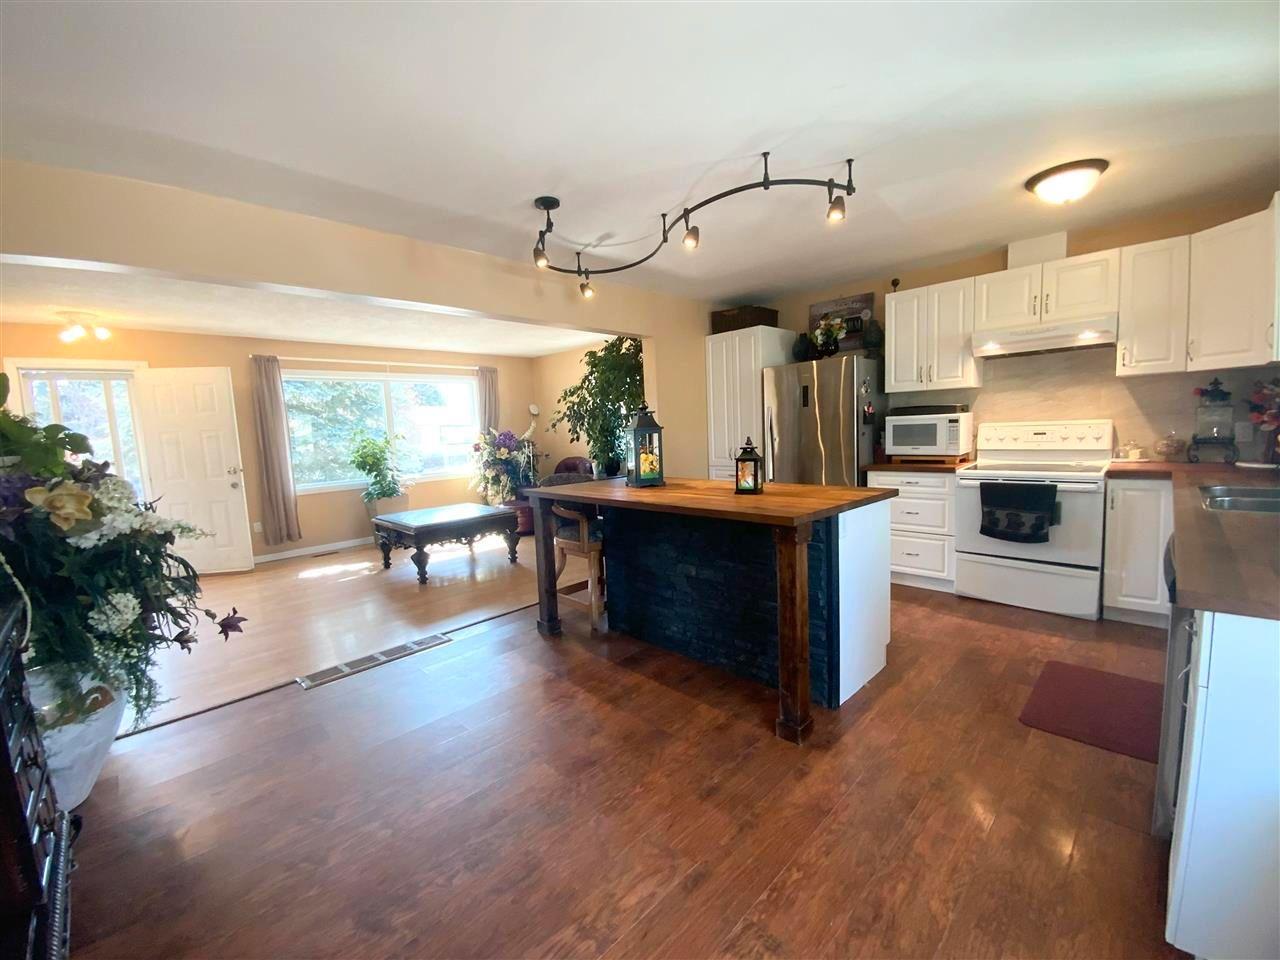 Main Photo: 162 Maple Crescent: Wetaskiwin House for sale : MLS®# E4241347